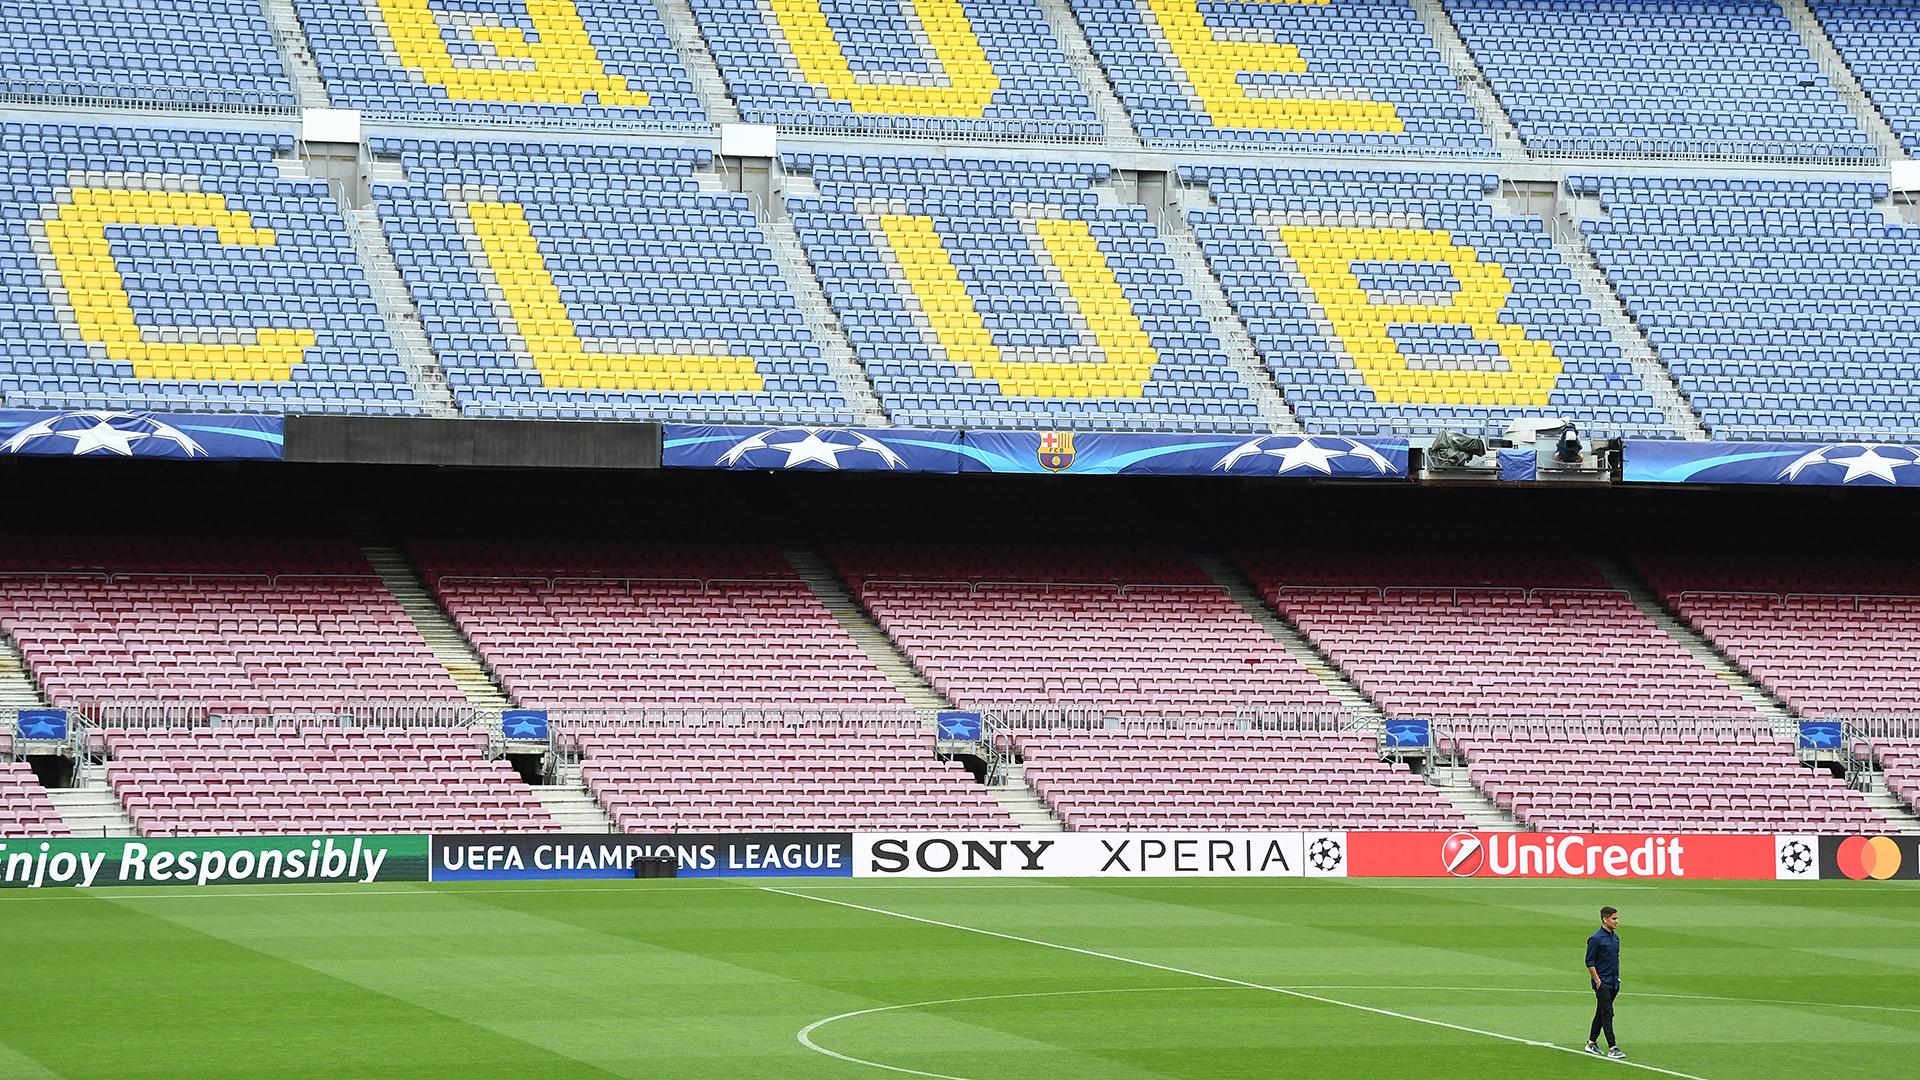 Paulo Dybala Juventus Camp Nou